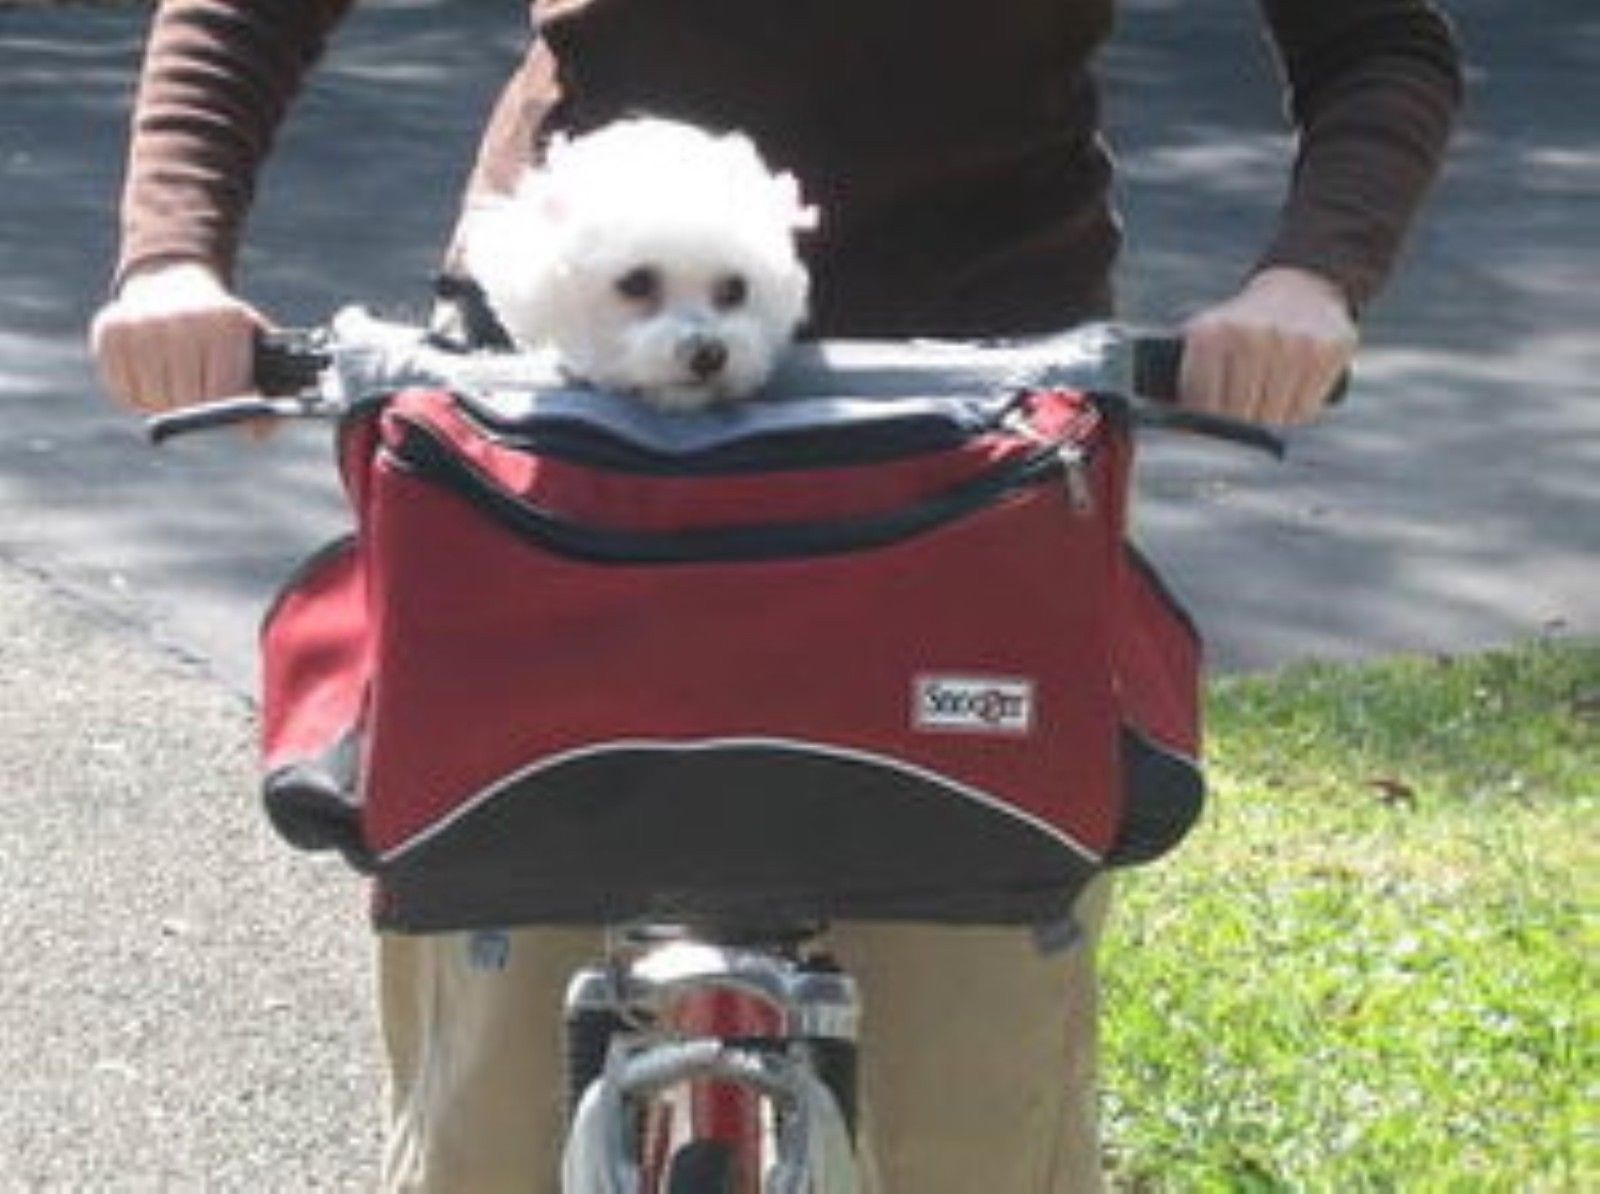 Bike baskets and trailers bike basket doubles as dog carrier